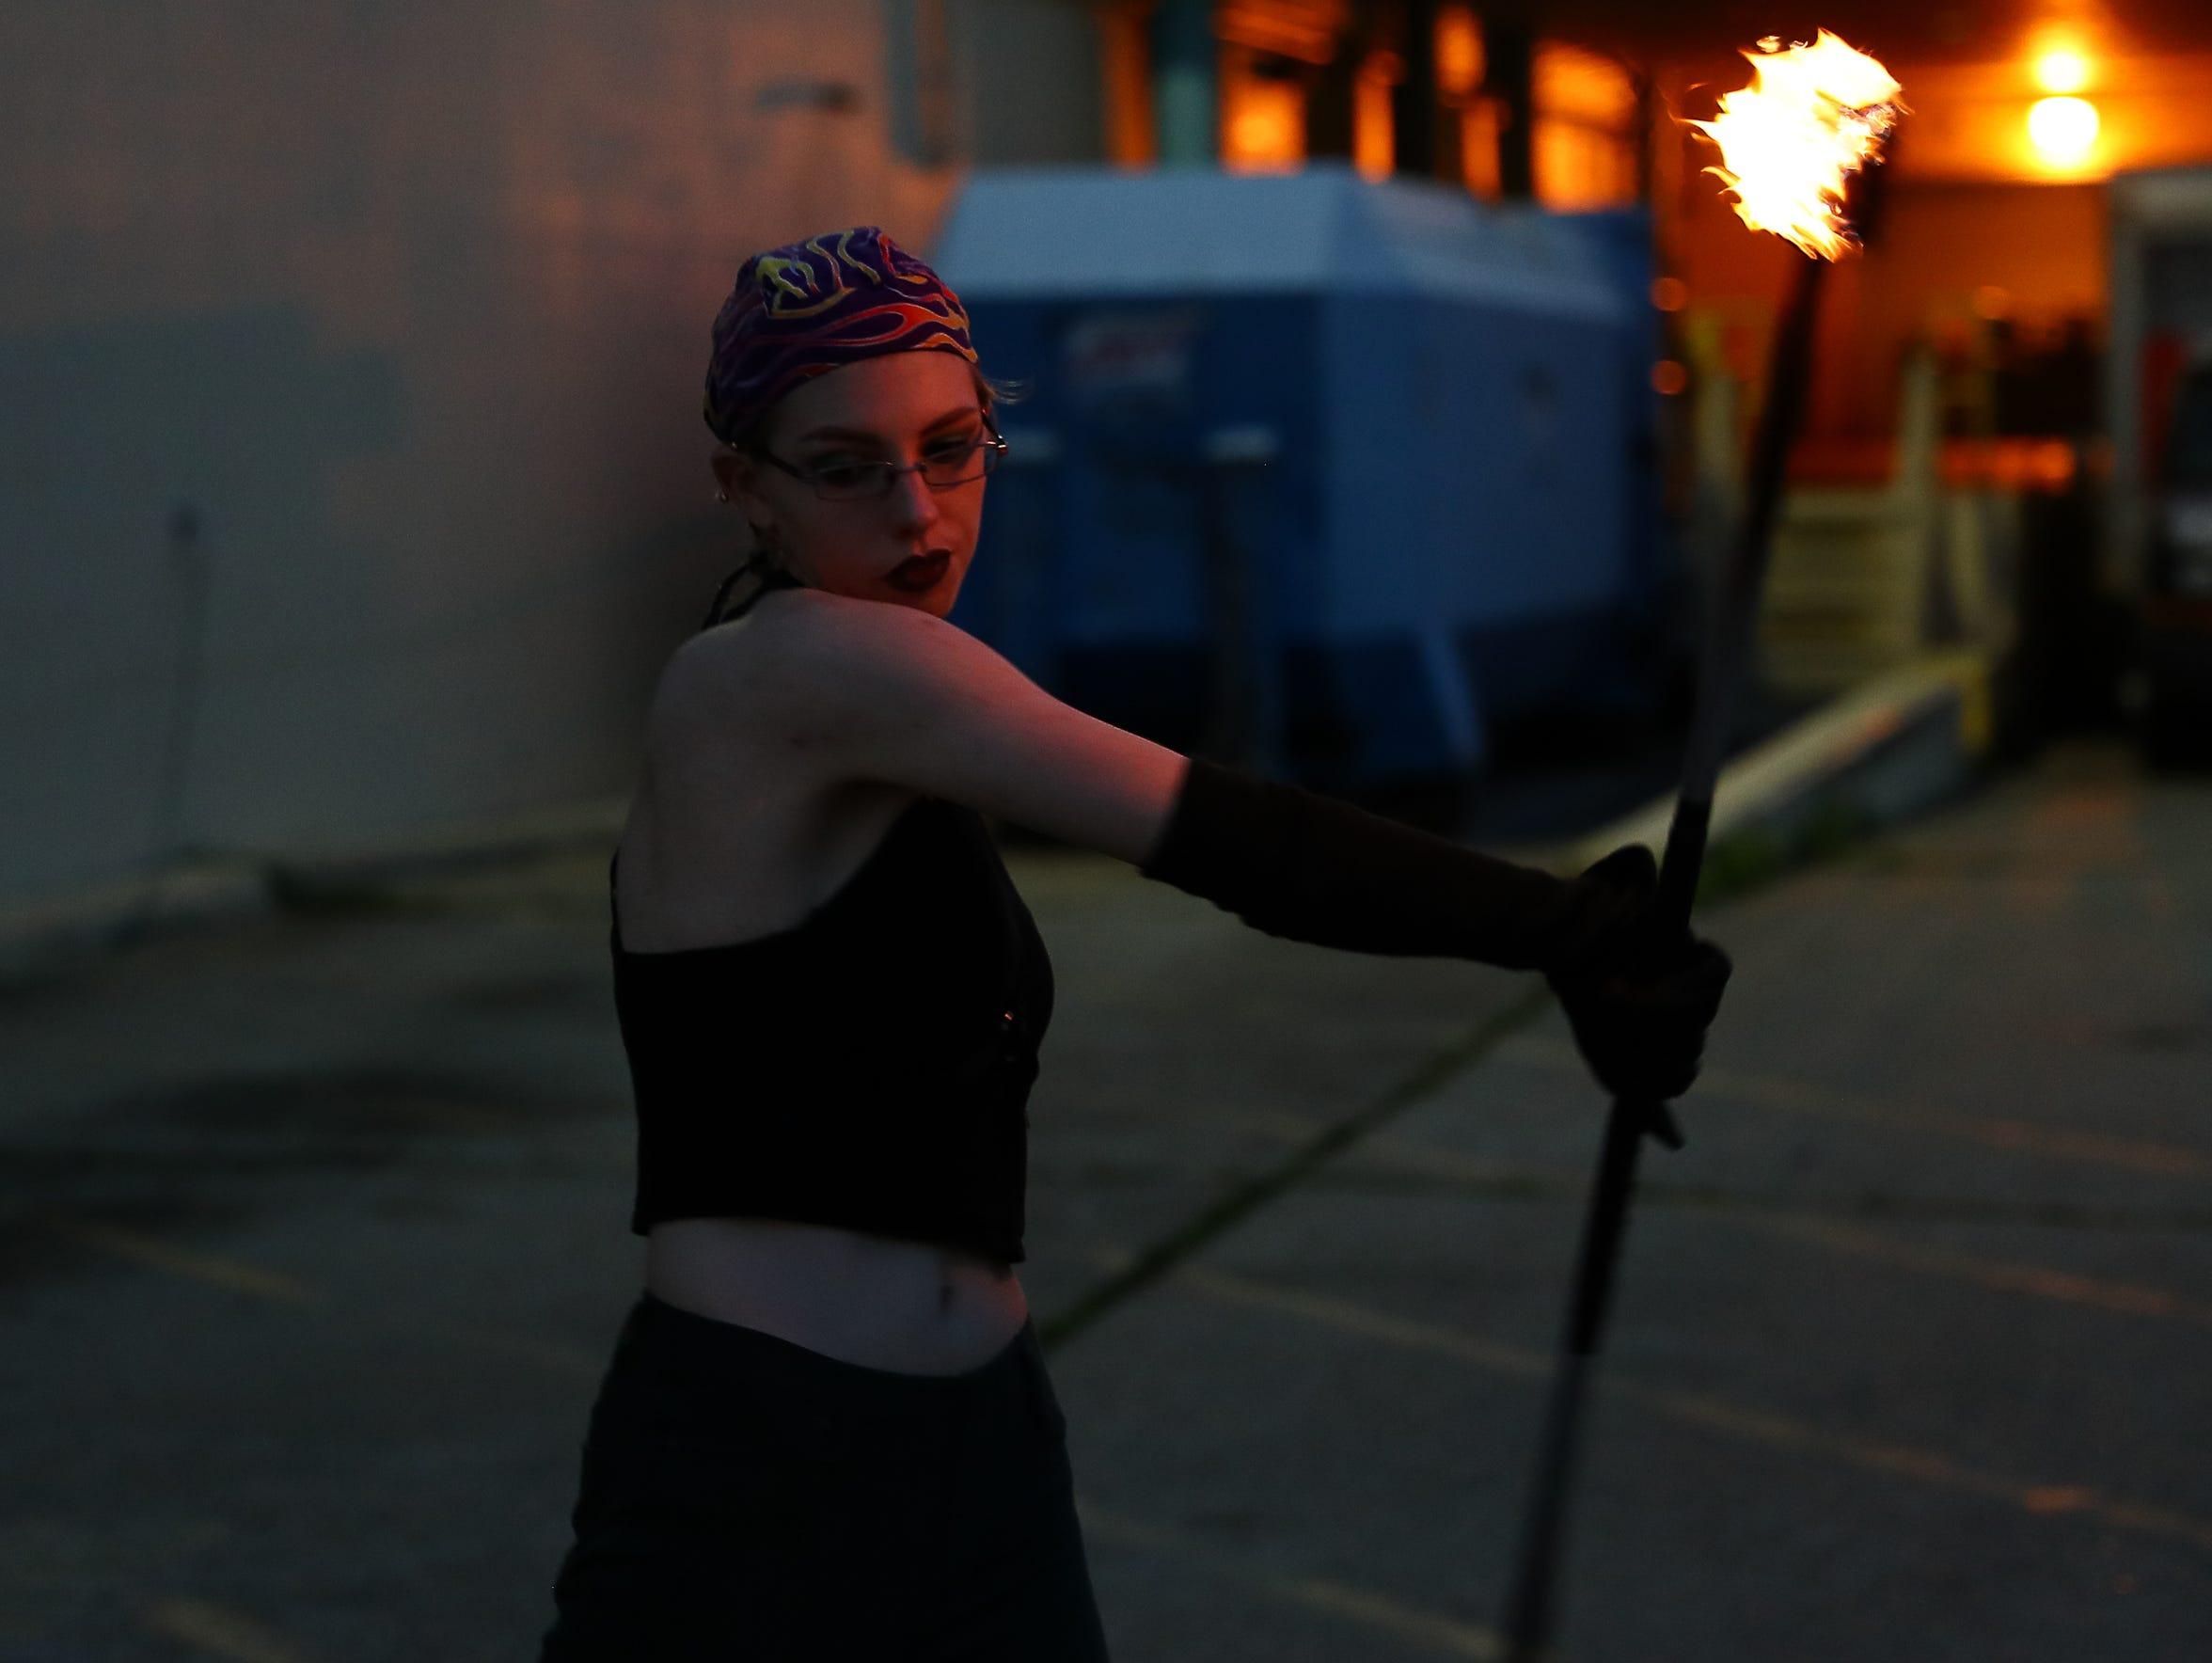 Viktoria Birr demonstrates fire spinning outside the